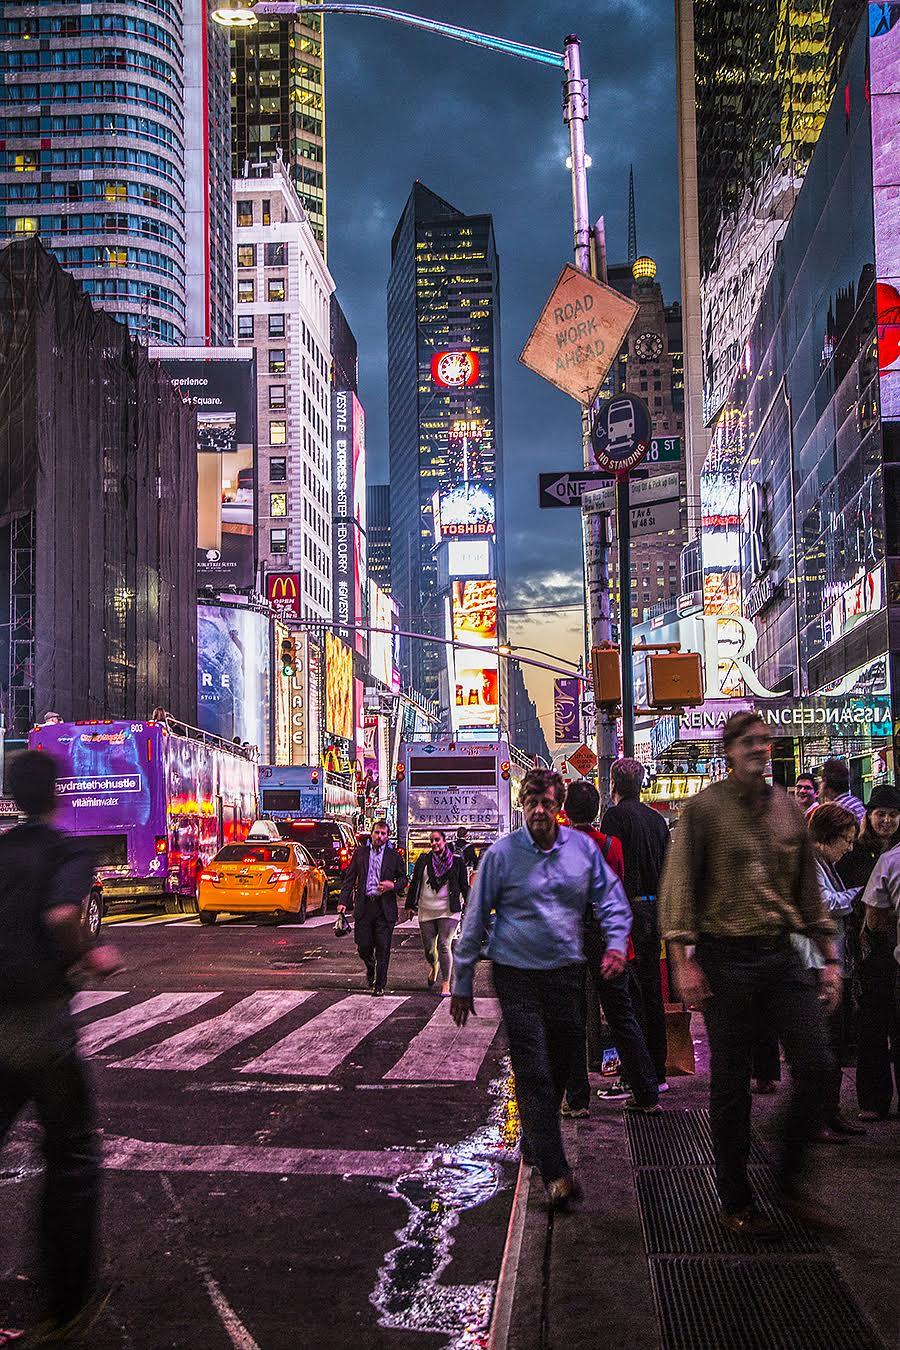 chinatown new york at night street lights